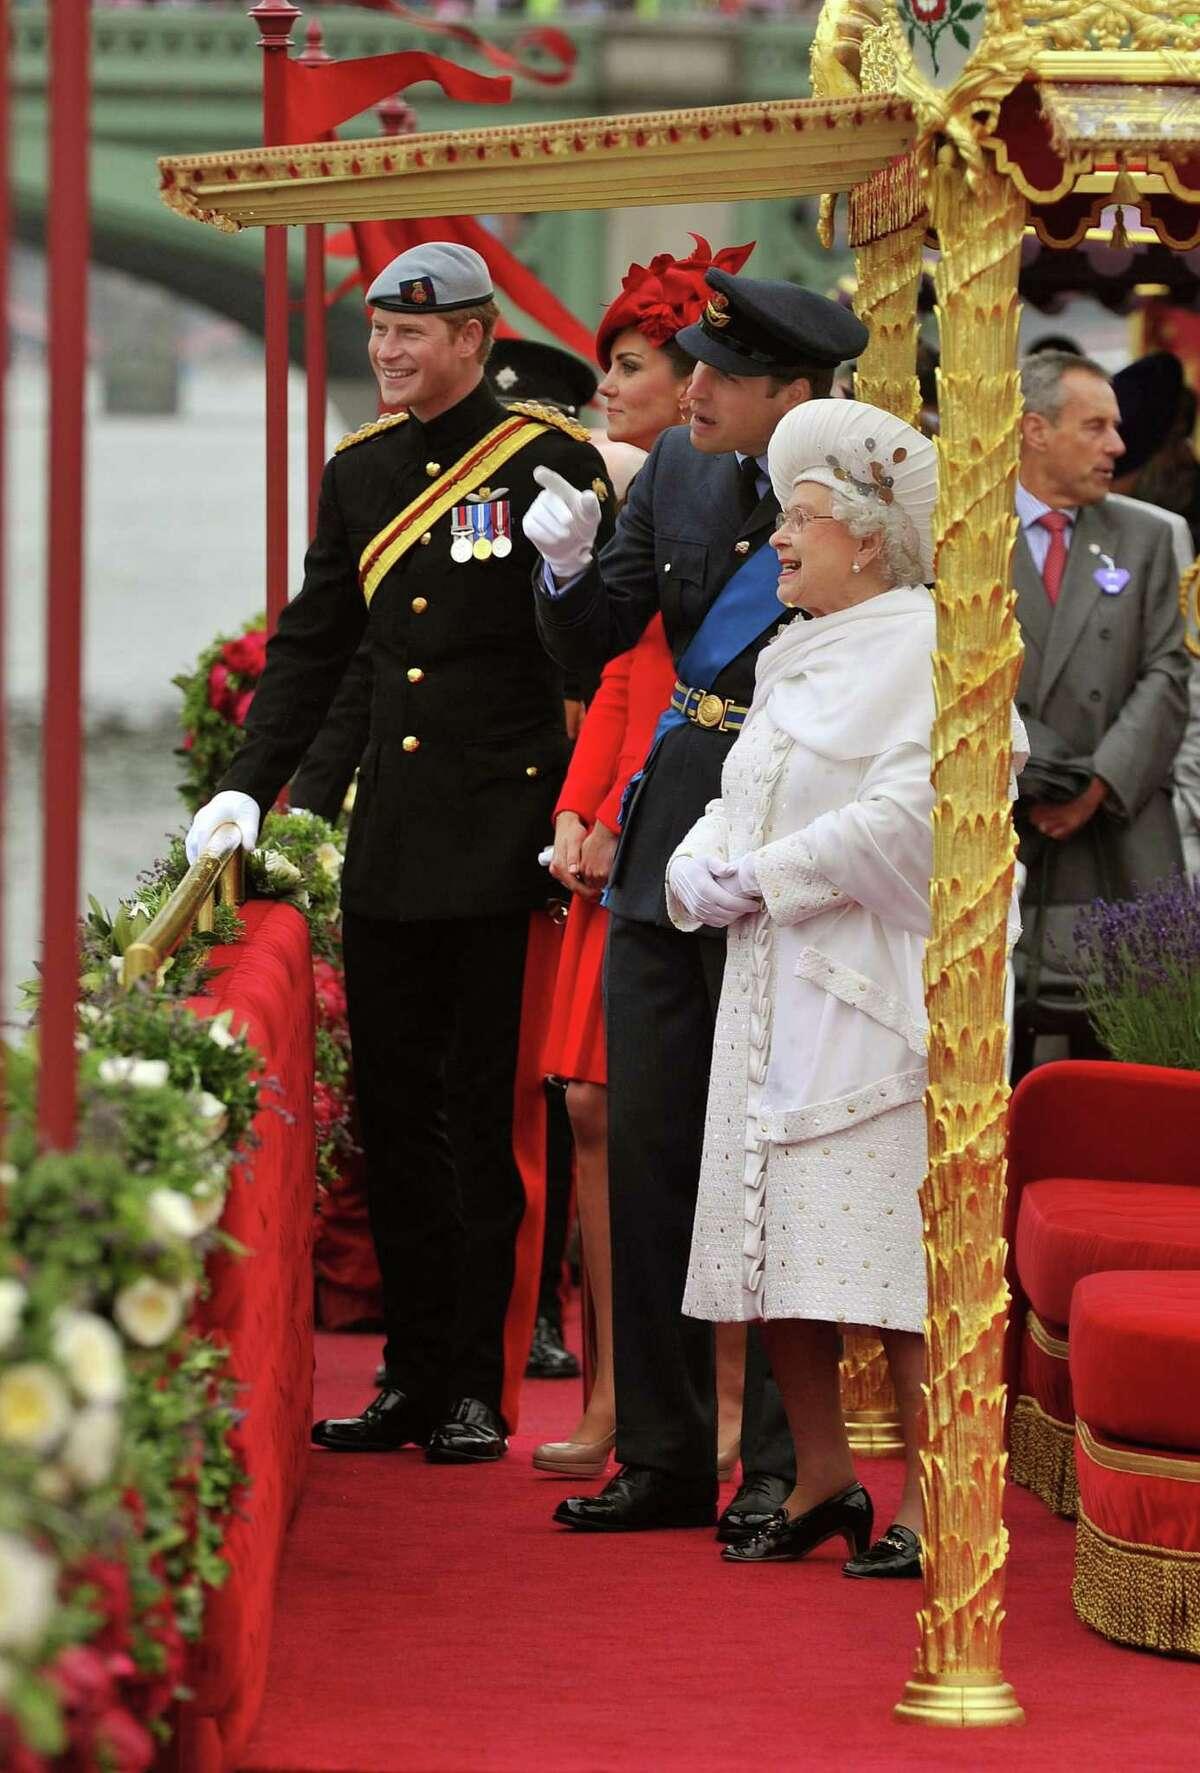 Britain Celebrates The Diamond Jubilee Of Queen Elizabeth